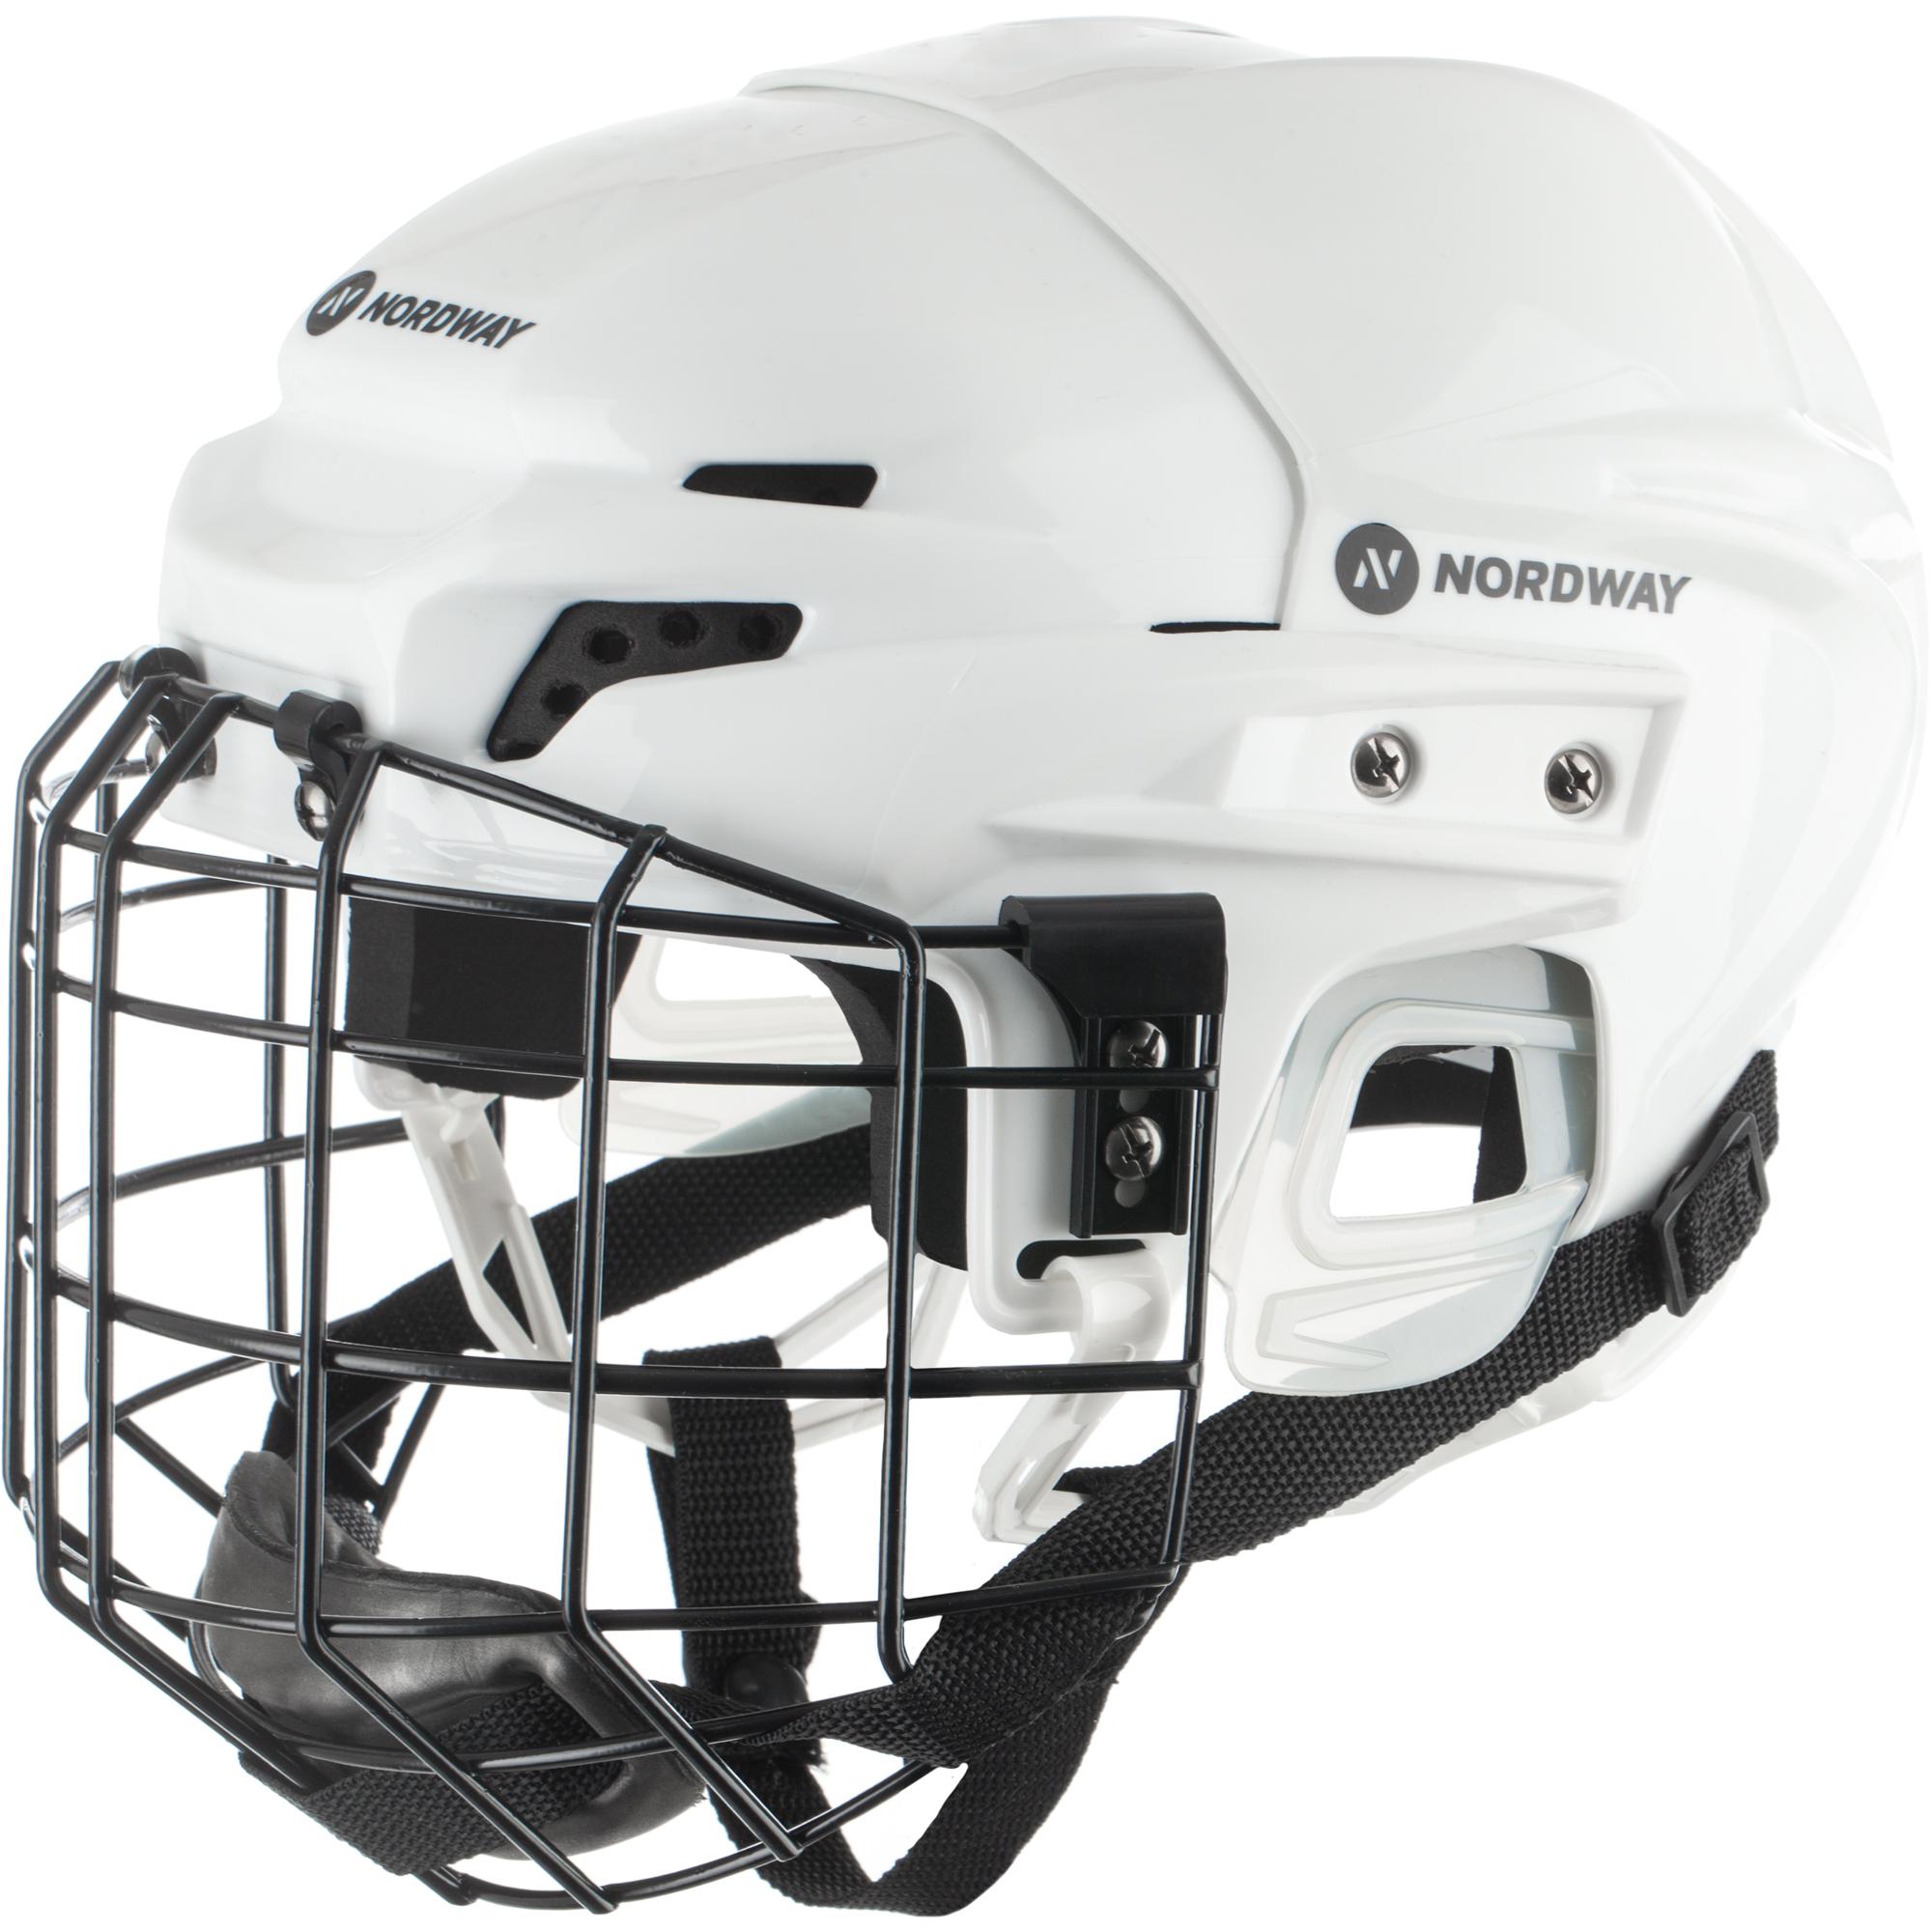 nordway шлем хоккейный nordway Nordway Шлем хоккейный с маской детский Nordway